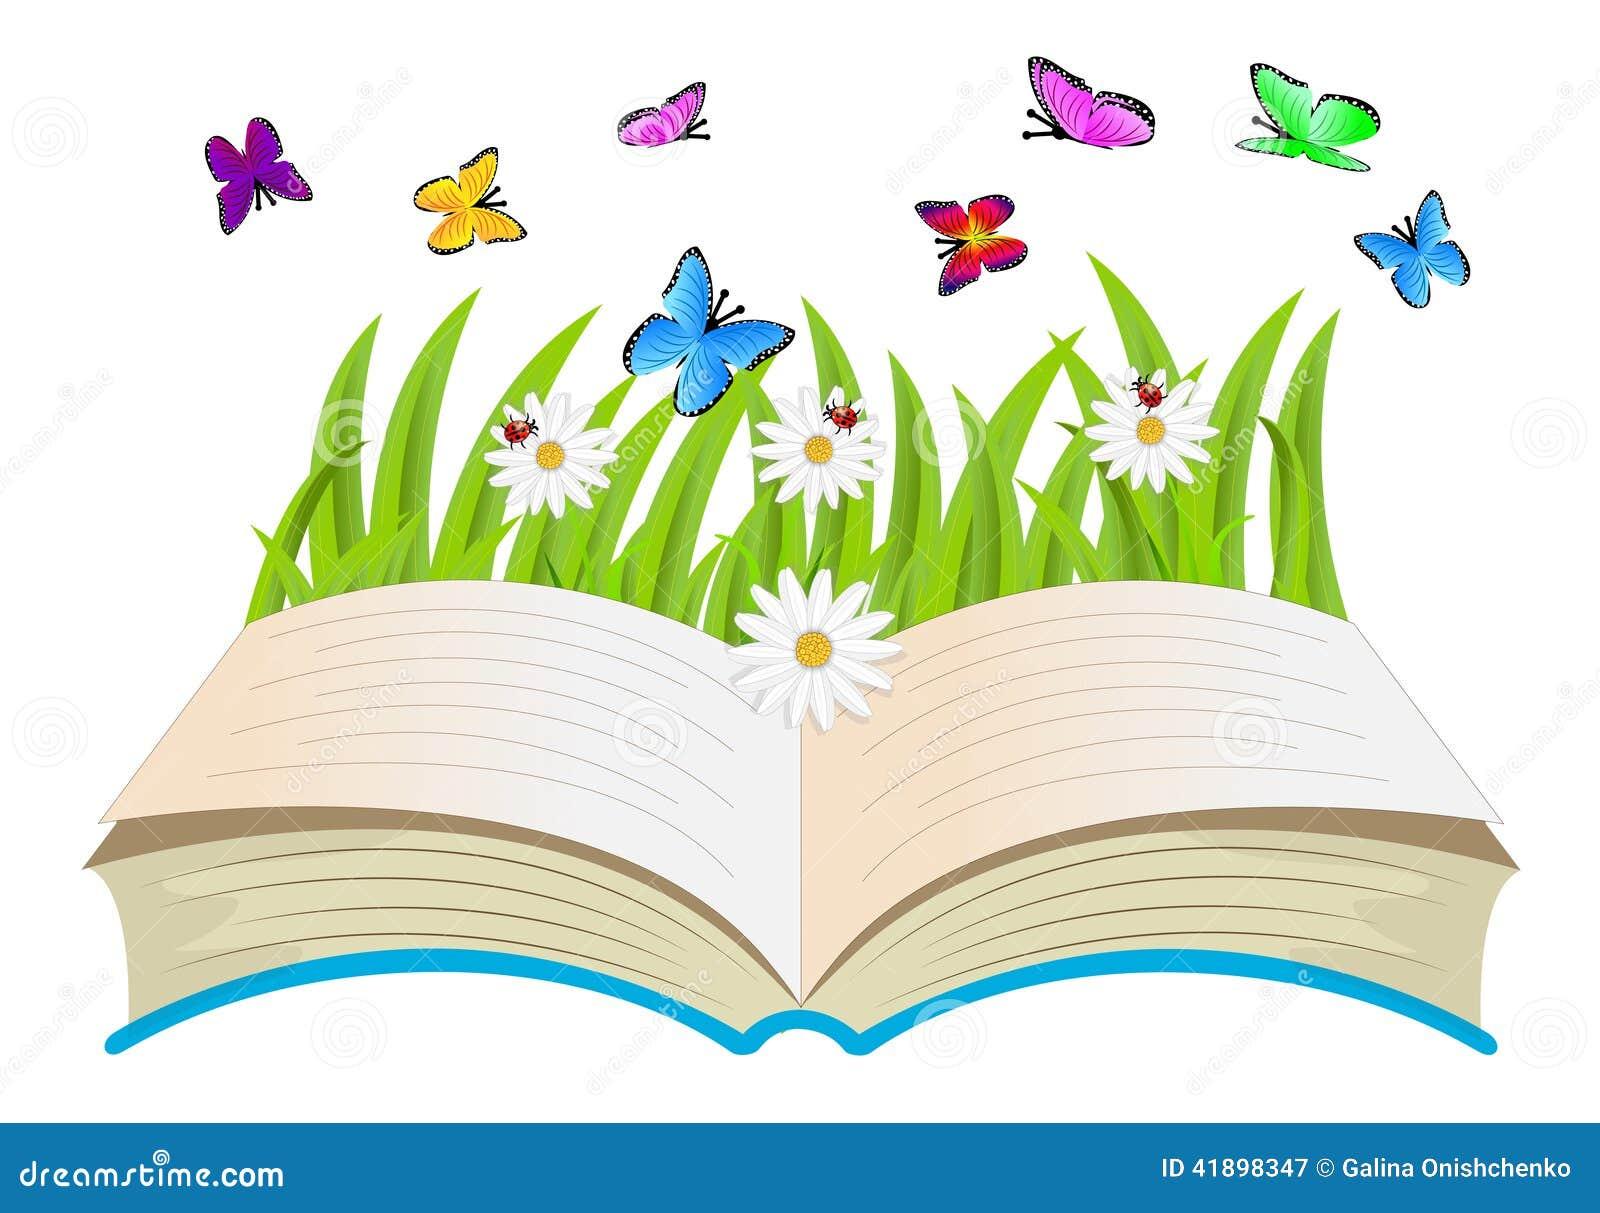 Open Book, Flowers And Butterflies Stock Vector - Image: 41898347